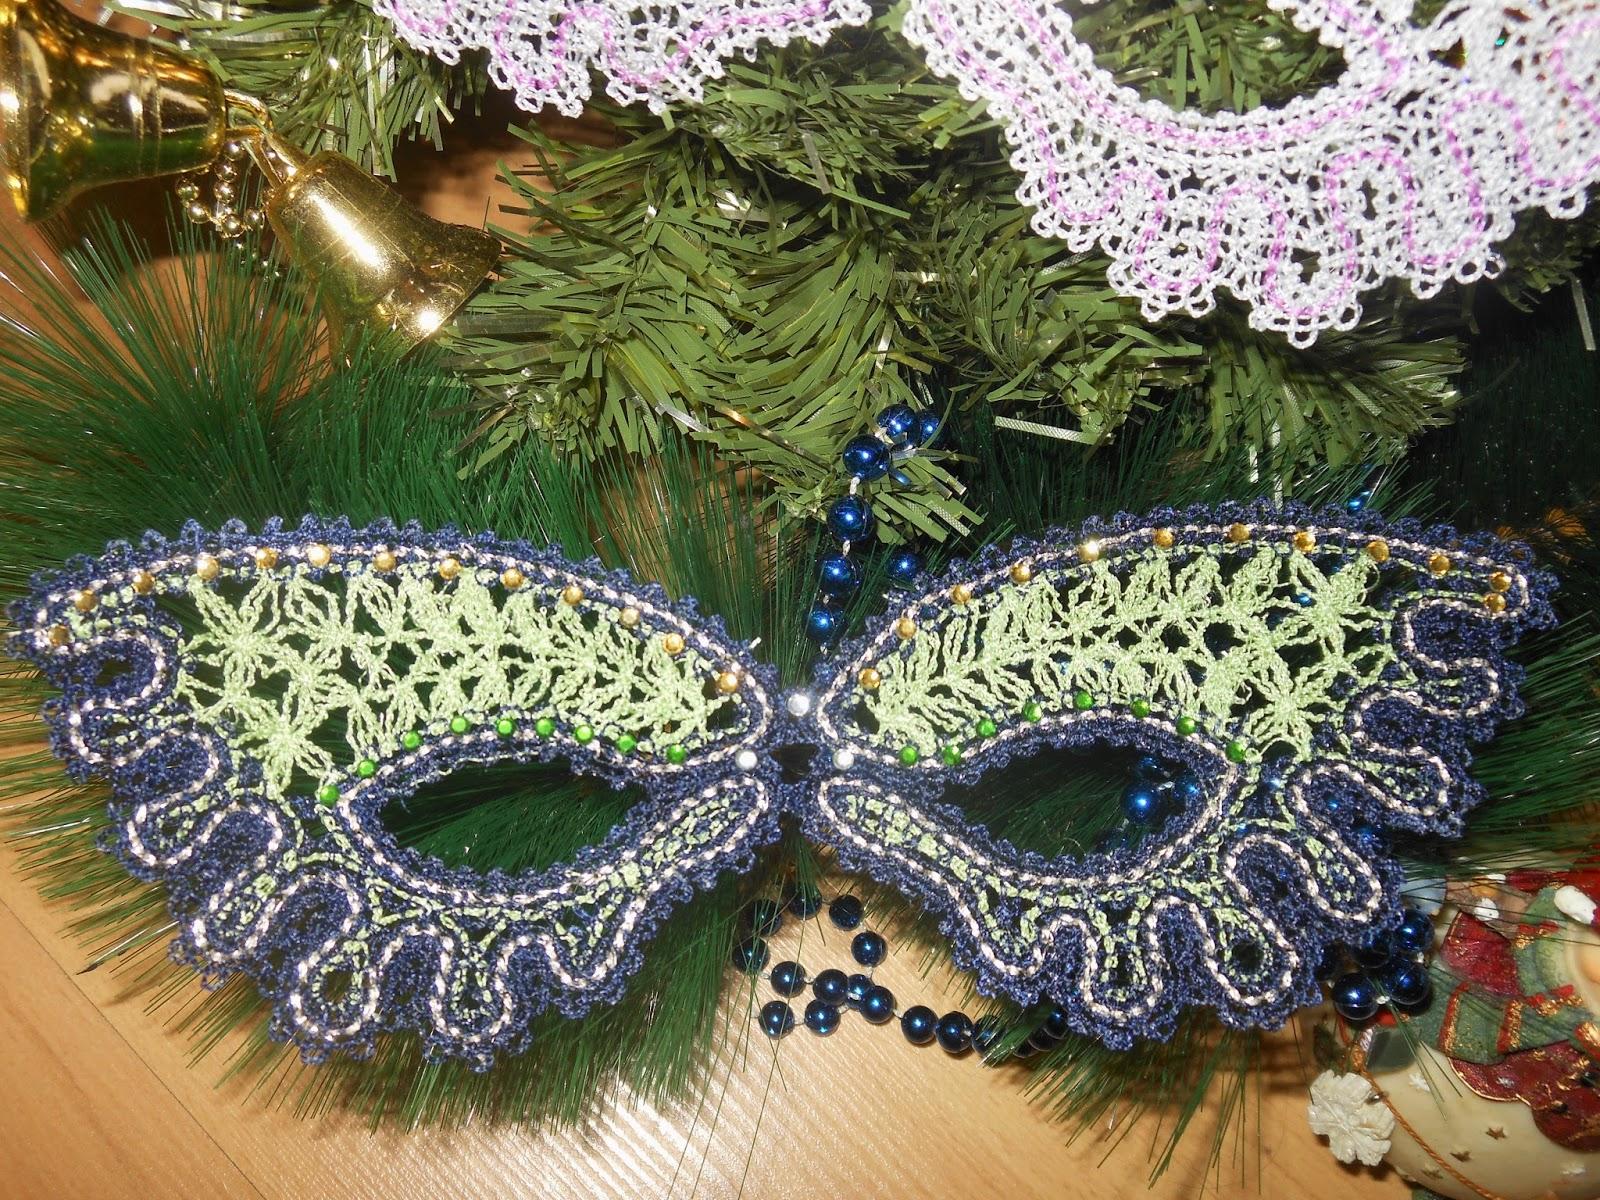 аксессуар на новый год, маска для вечеринки, наряд для вечеринки, маска, стильные маски, маски, кружевные маски, маски для карнавала, новый год, наряд на корпоратив, маскарад. маски для маскарада